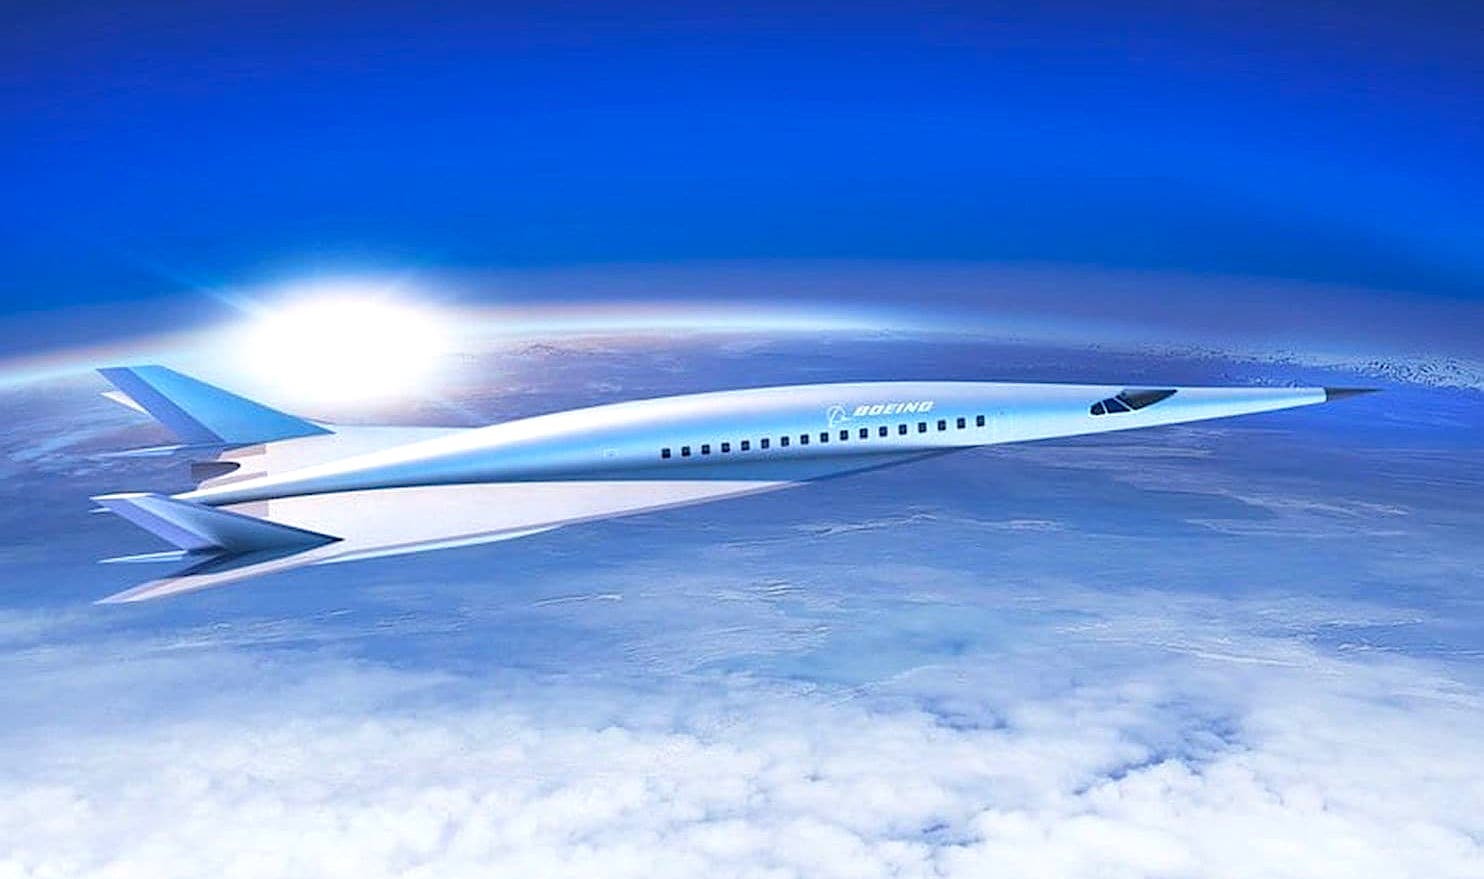 boeing prototype avion supersonique 2018